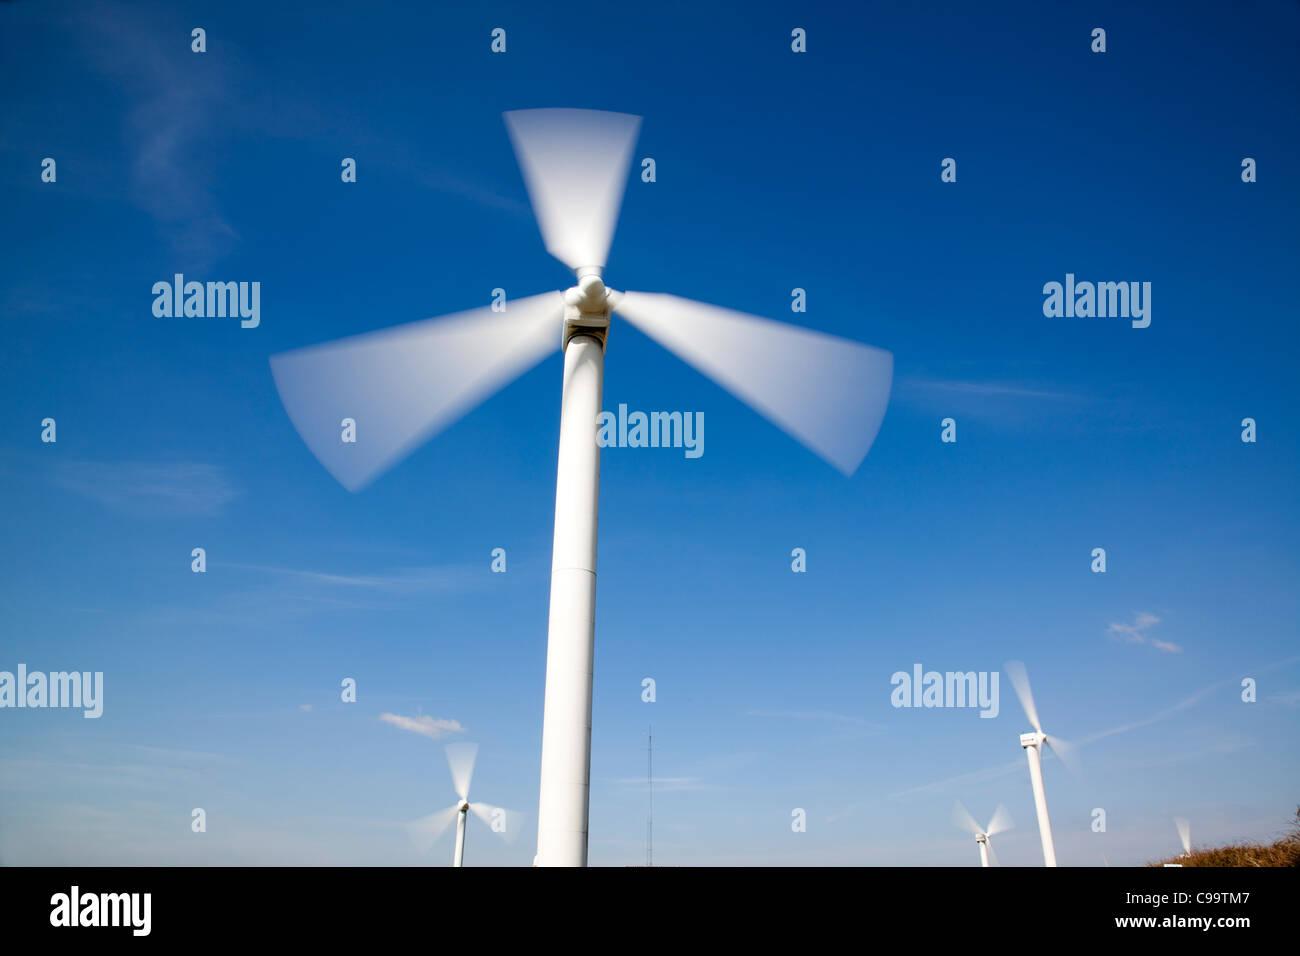 Windpark, Windrad gegen blauen Himmel Stockbild